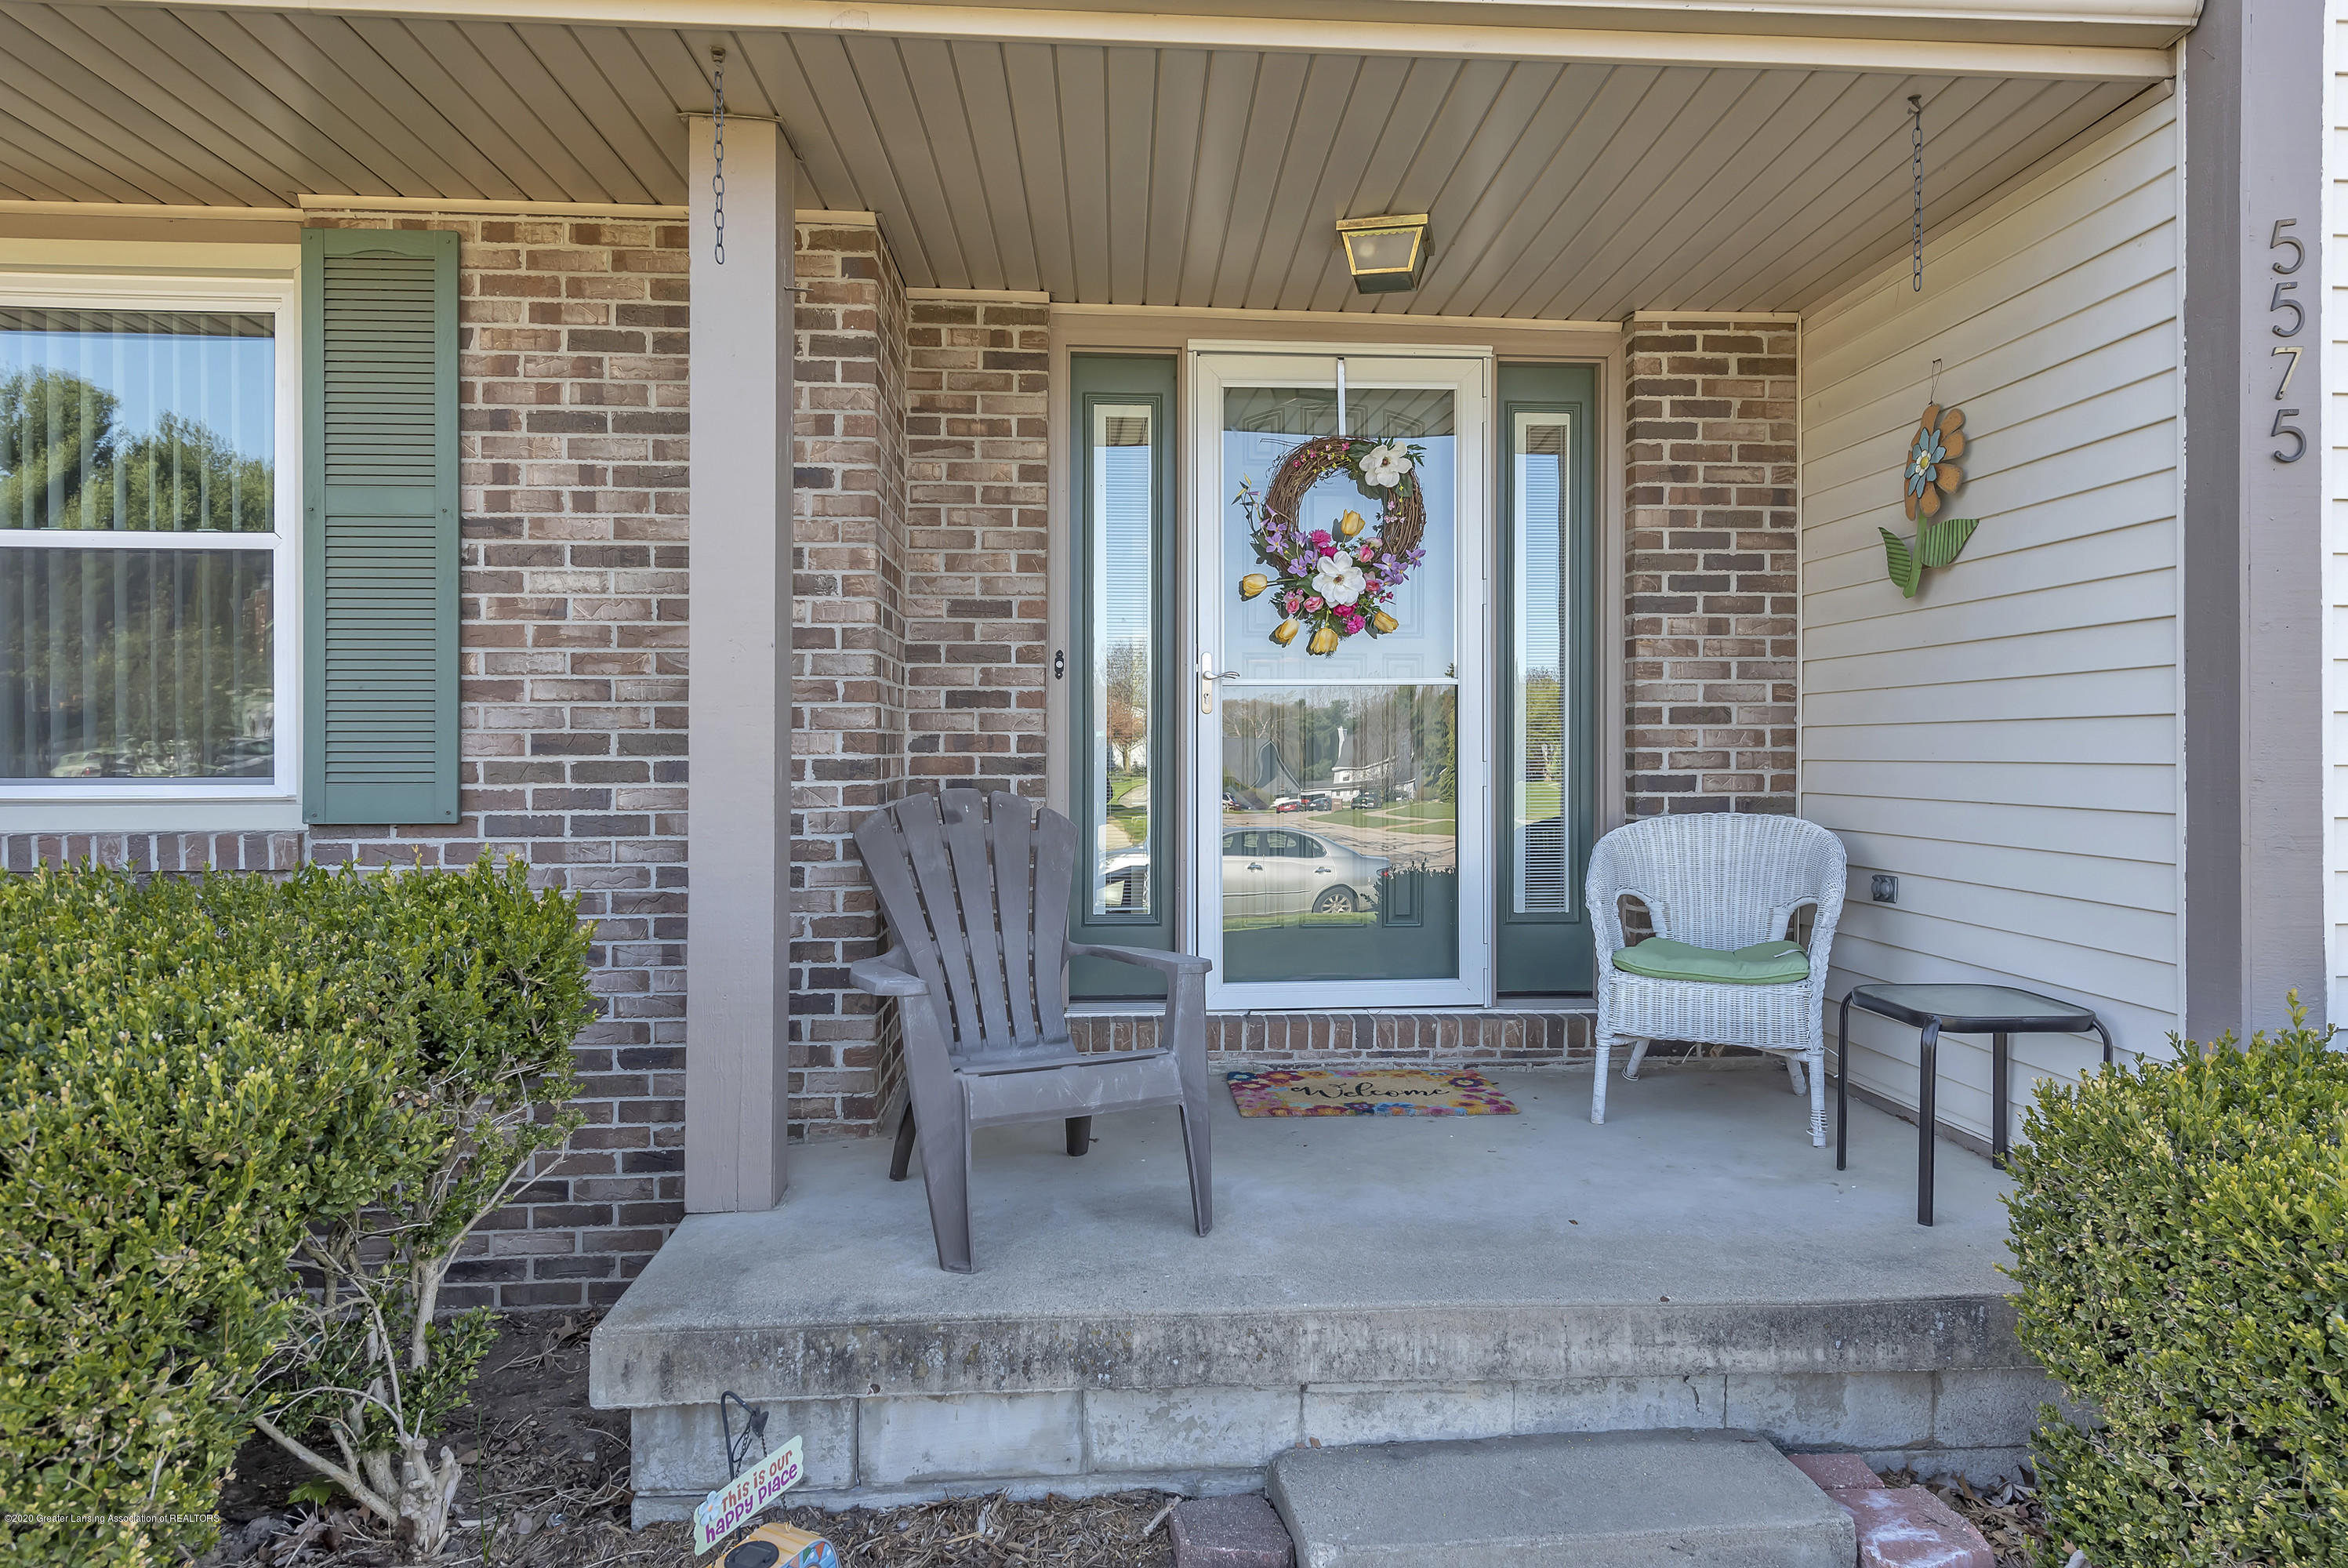 5575 Canoga Ln - Front Porch - 3